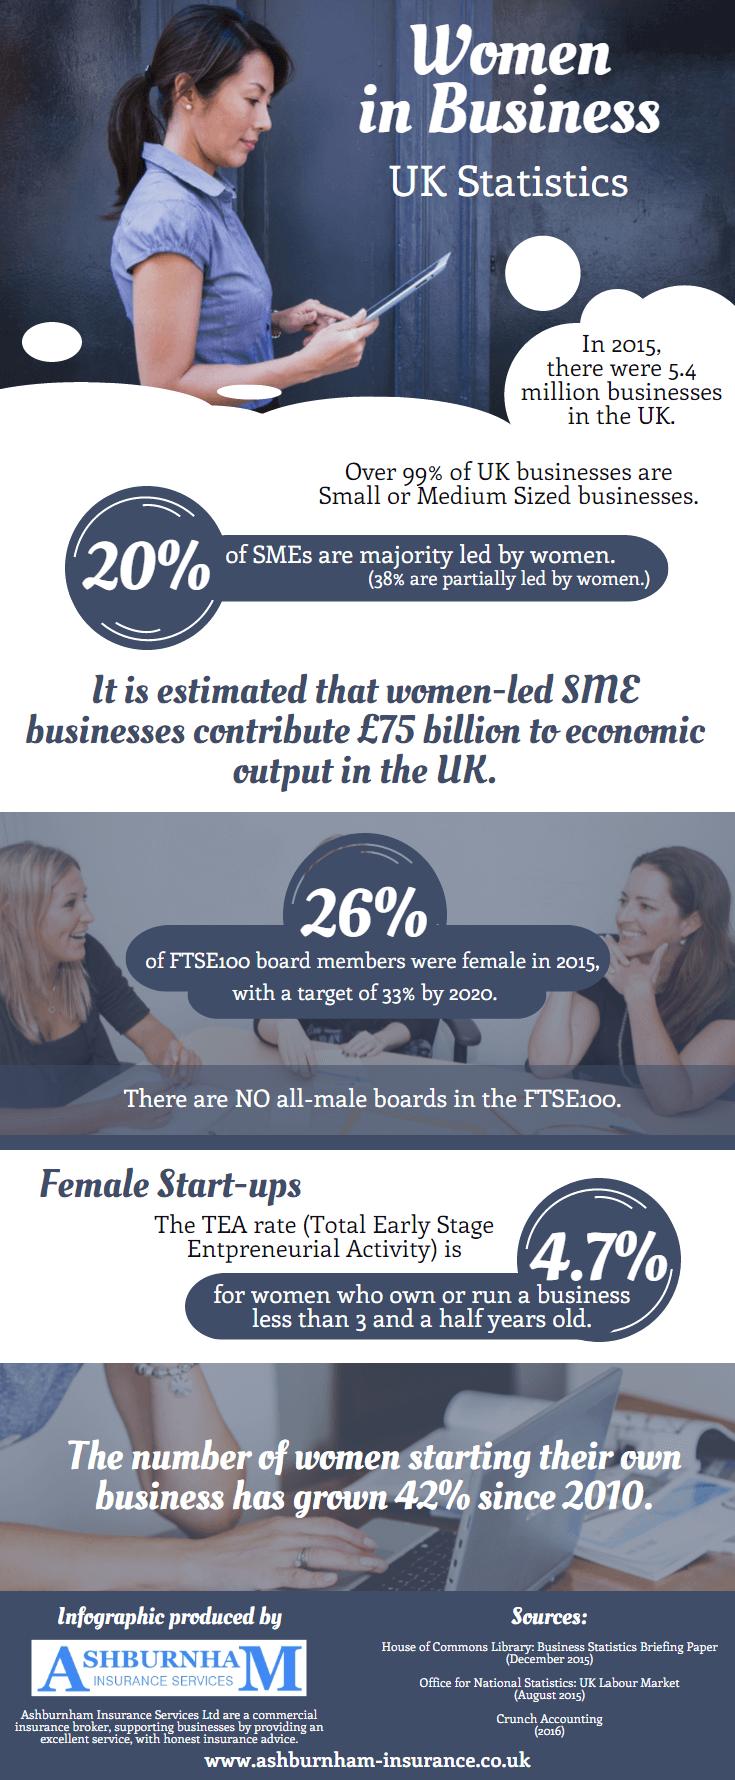 Women in Business: UK Statistics [Infographic]